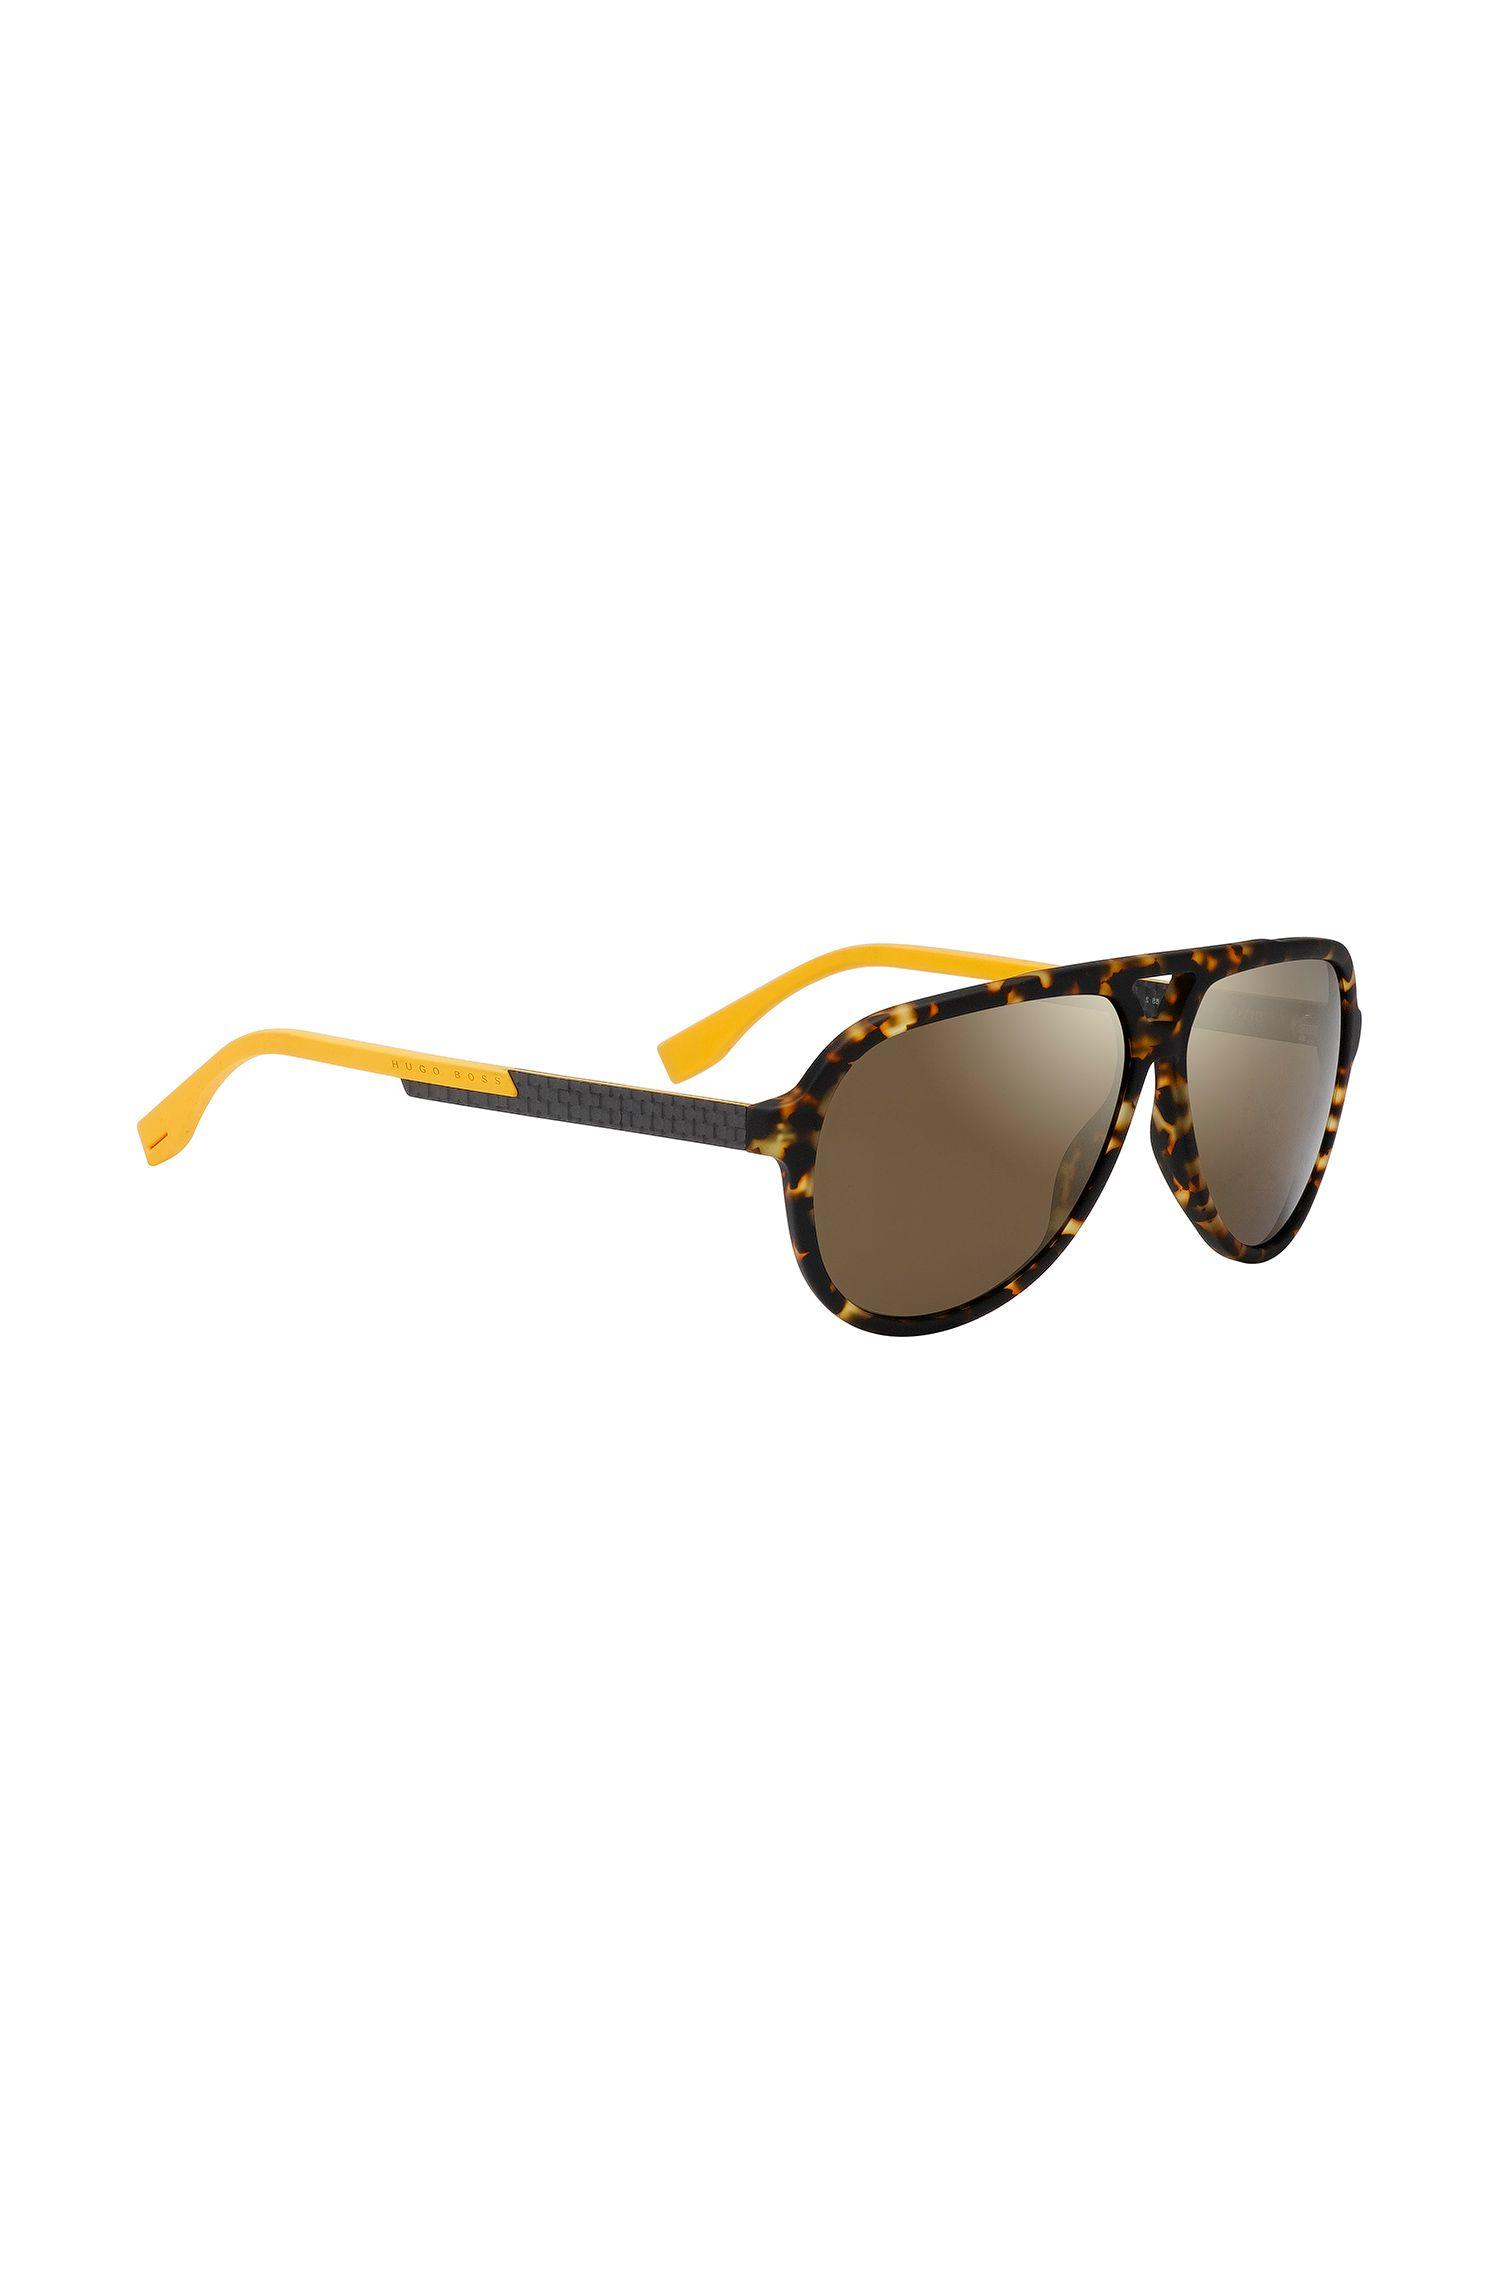 Gafas de sol: 'BOSS 0731/S', Assorted-Pre-Pack